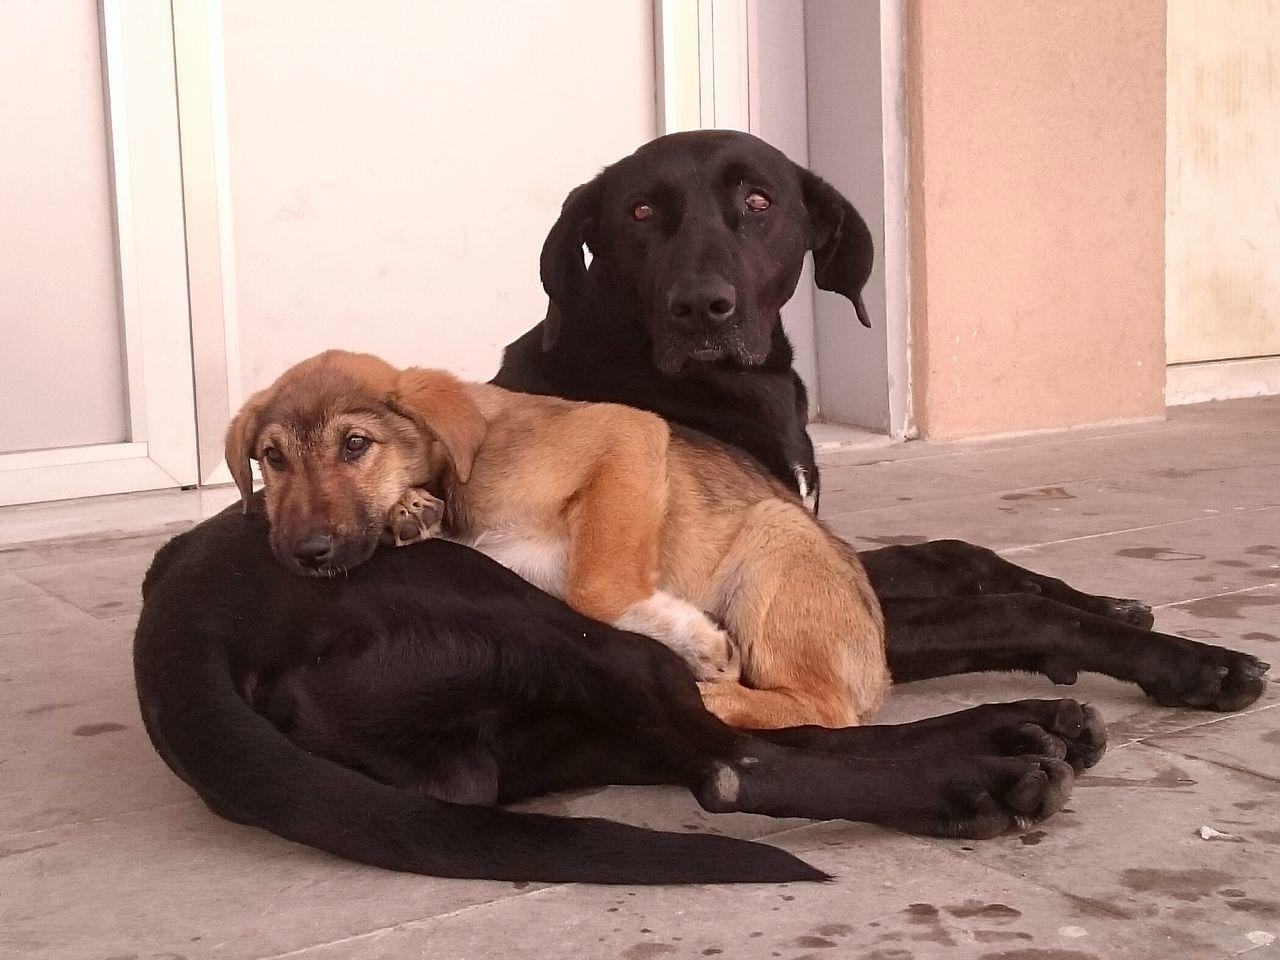 Köpek Yavruköpek Baba Ogul Sonyphotography Sony Xperia Z3 Dog Dogs Dog Love Puppy Puppy Love Outdoors EyeEm Best Shots EyeEm Gallery EyeEm EyeEm Best Edits EyeEmBestPics Eyeemphotography Eyeemphoto